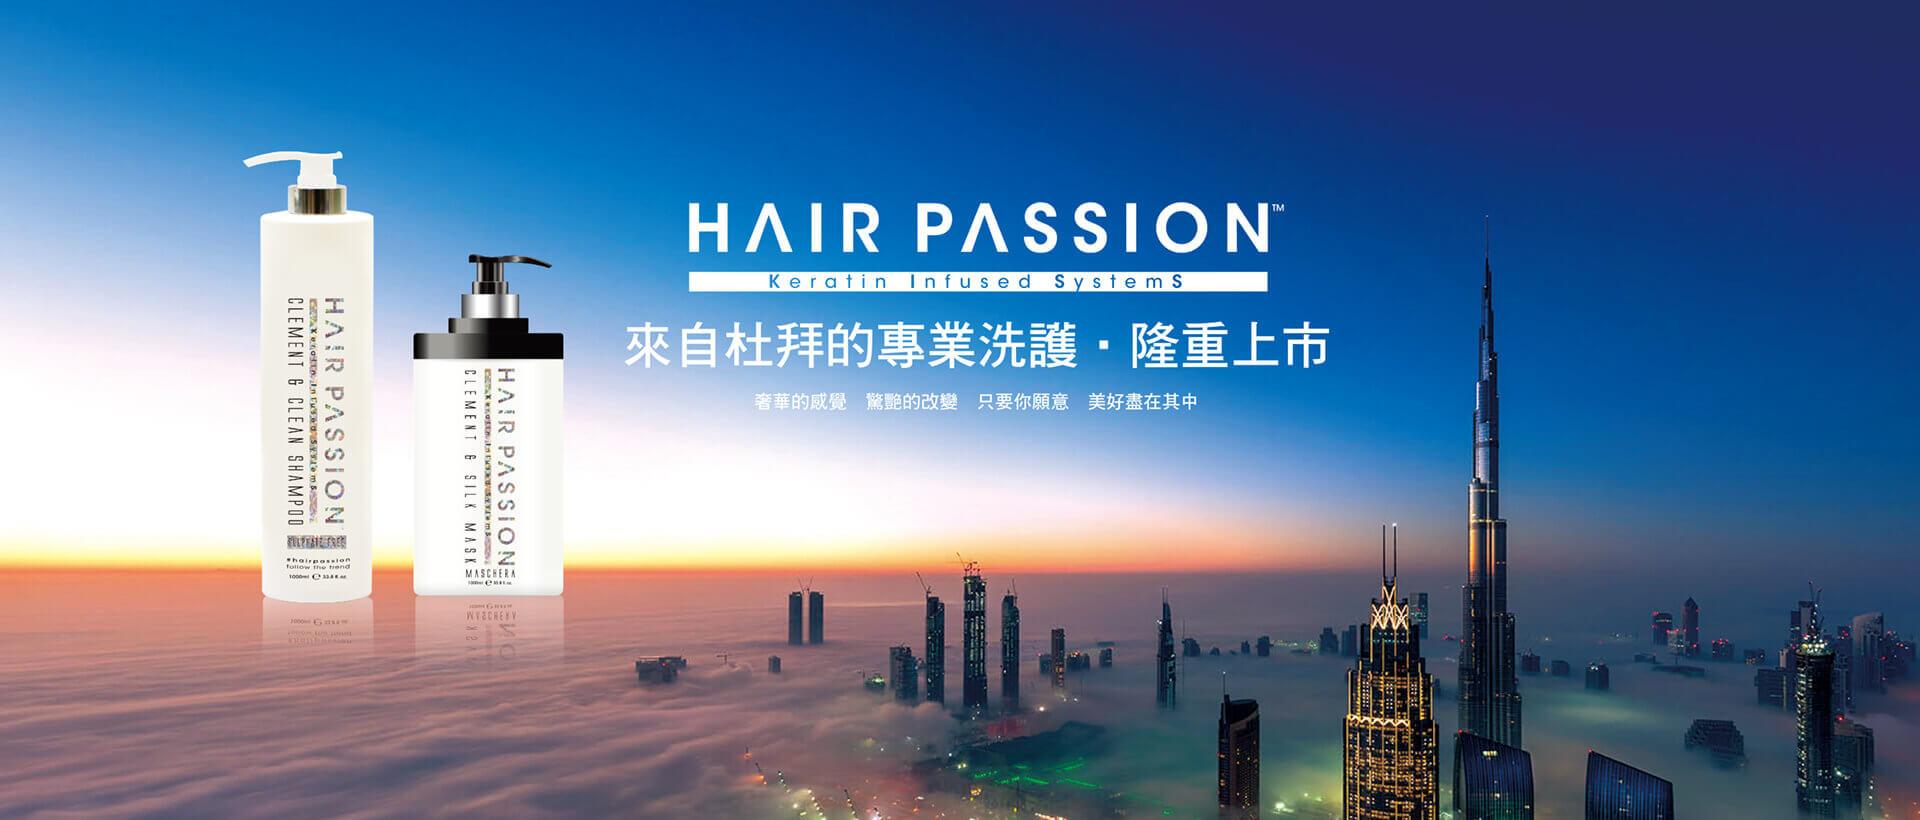 HP 白茶馨香輕度深層洗髮精&HP S1光纖深層髮膜